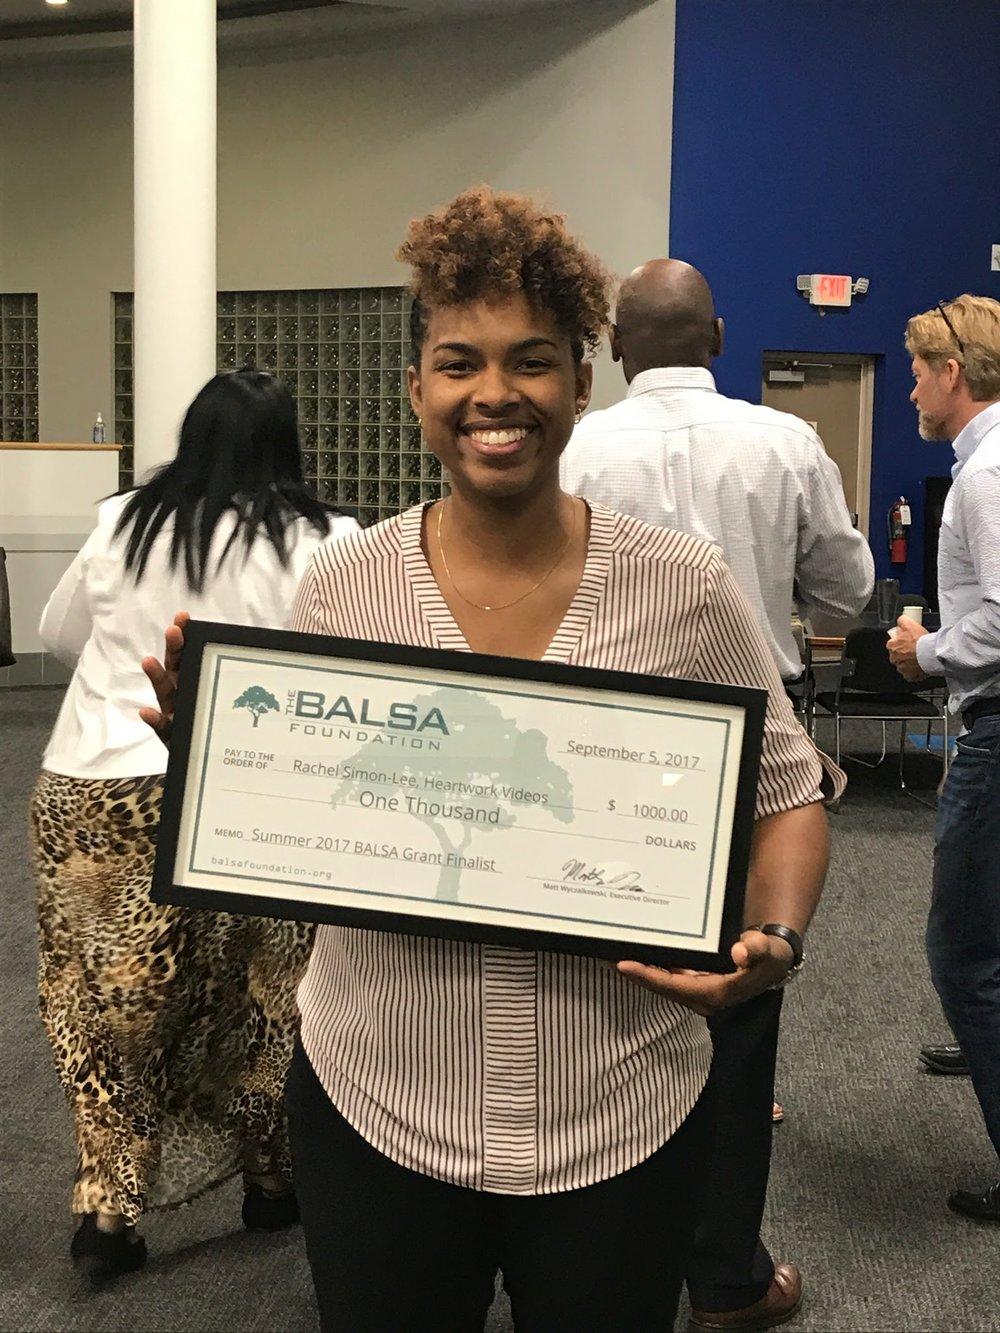 Heartwork Videos founder, Rachel Simon-Lee, BALSA Grant finalist